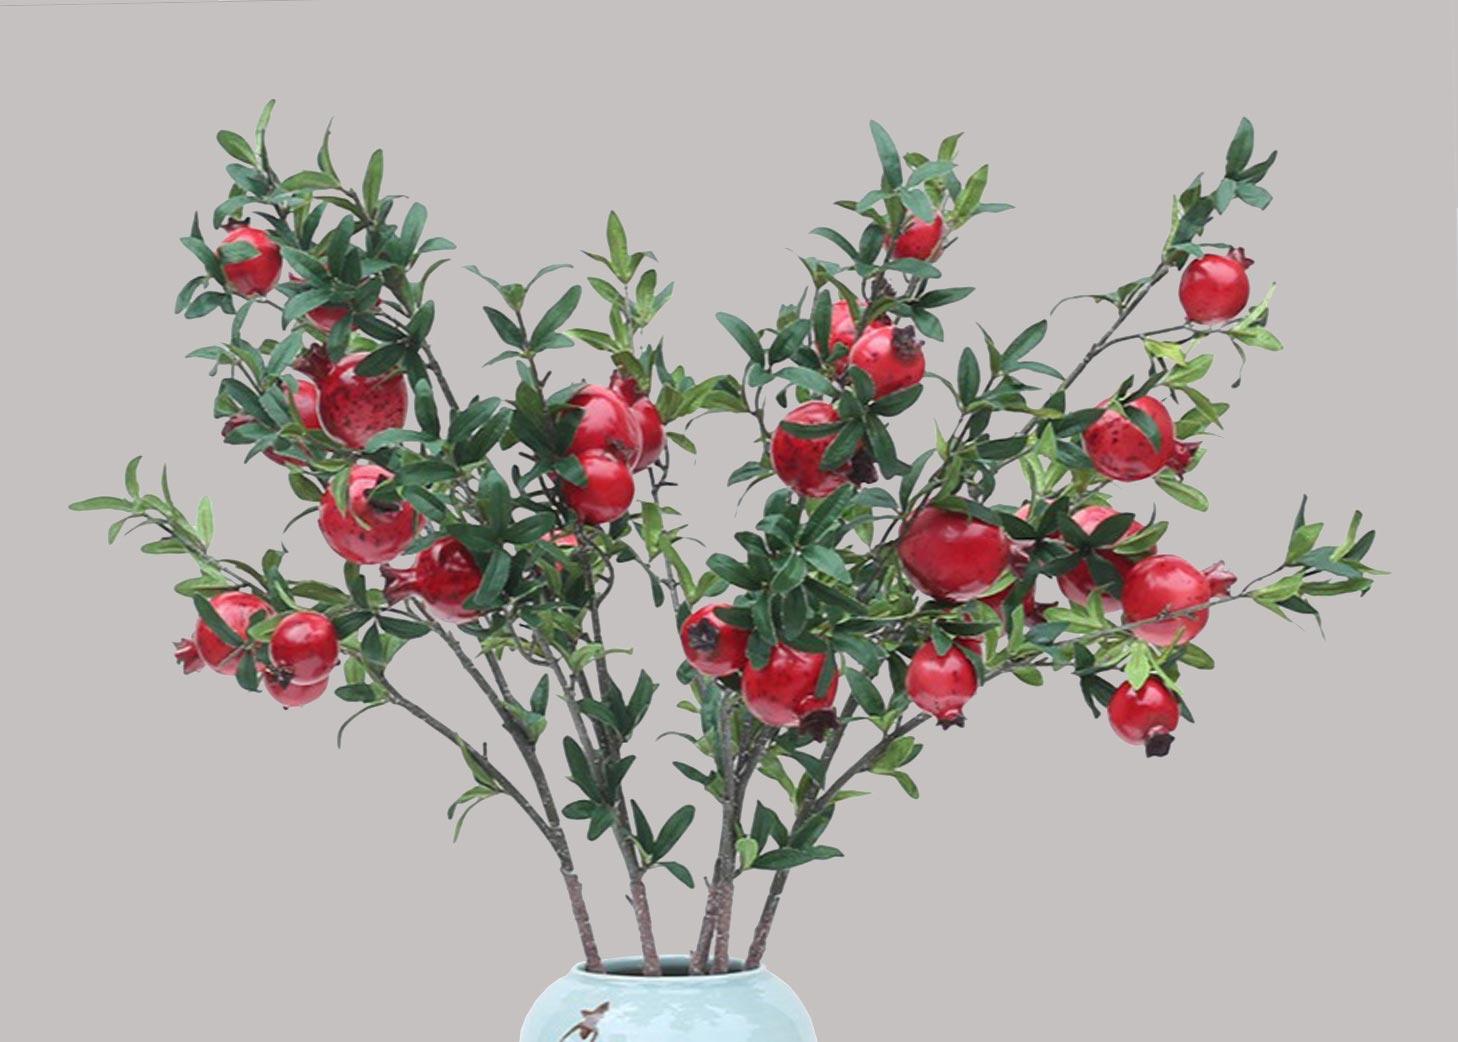 Pomegranate branches <br> กิ่งทับทิม <br> SKU: 11001 - Red